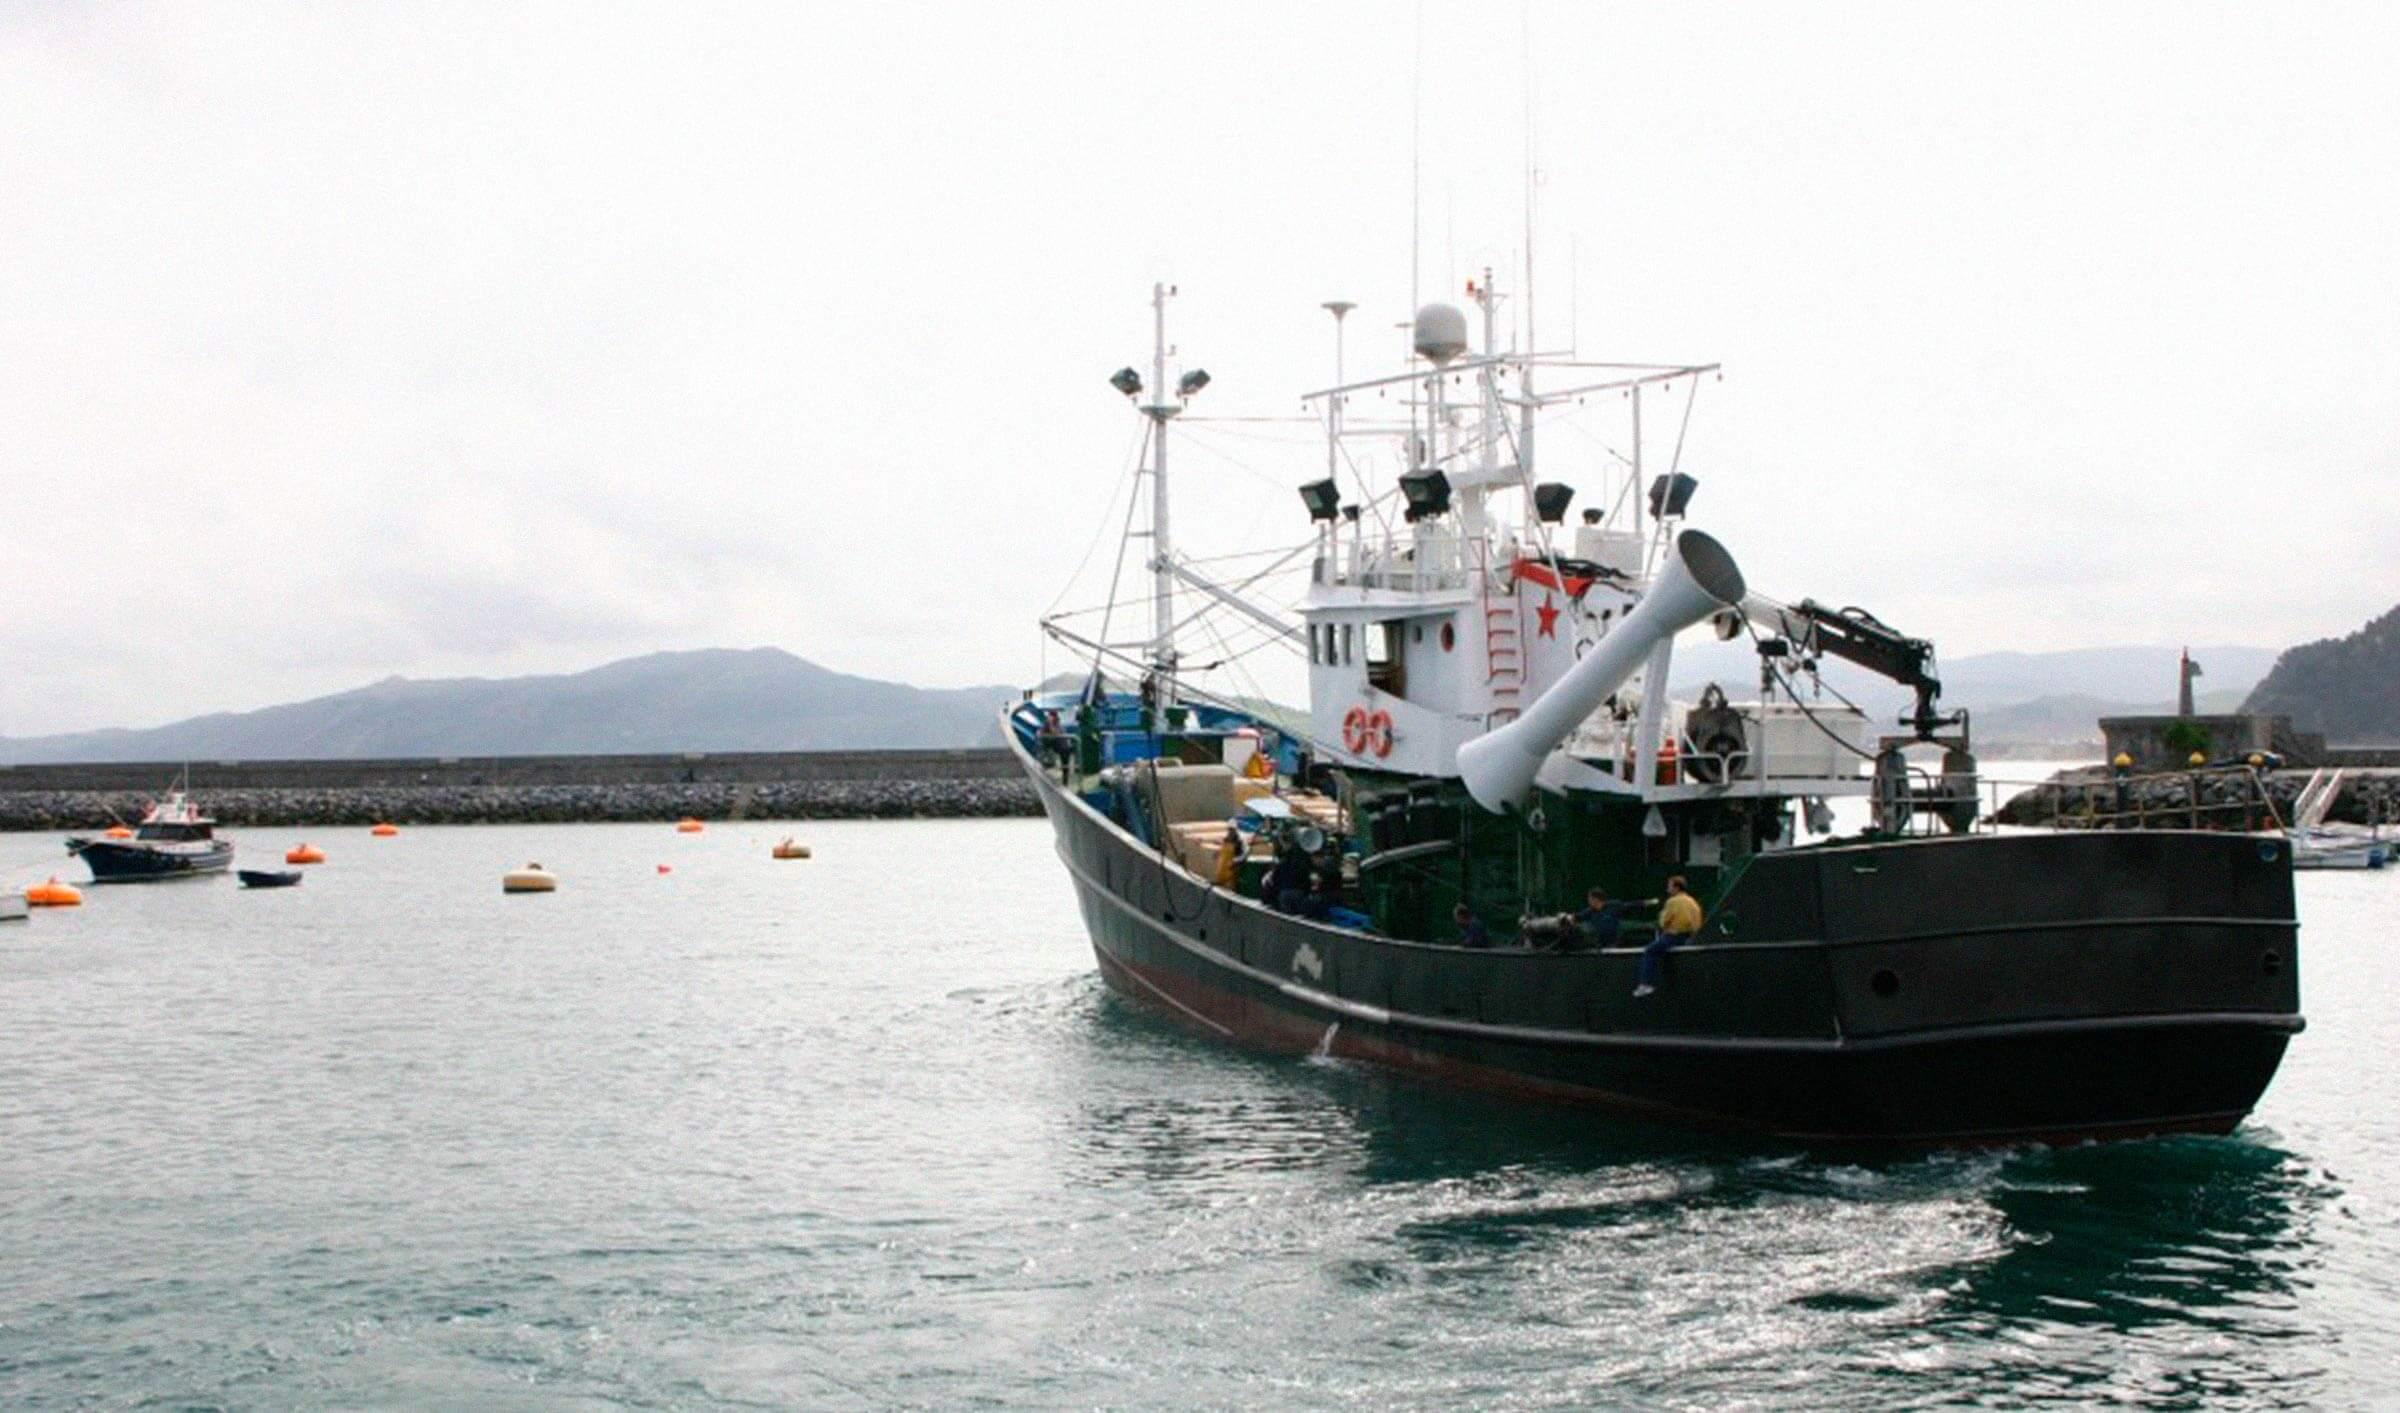 eficiencia energética en buques pesqueros